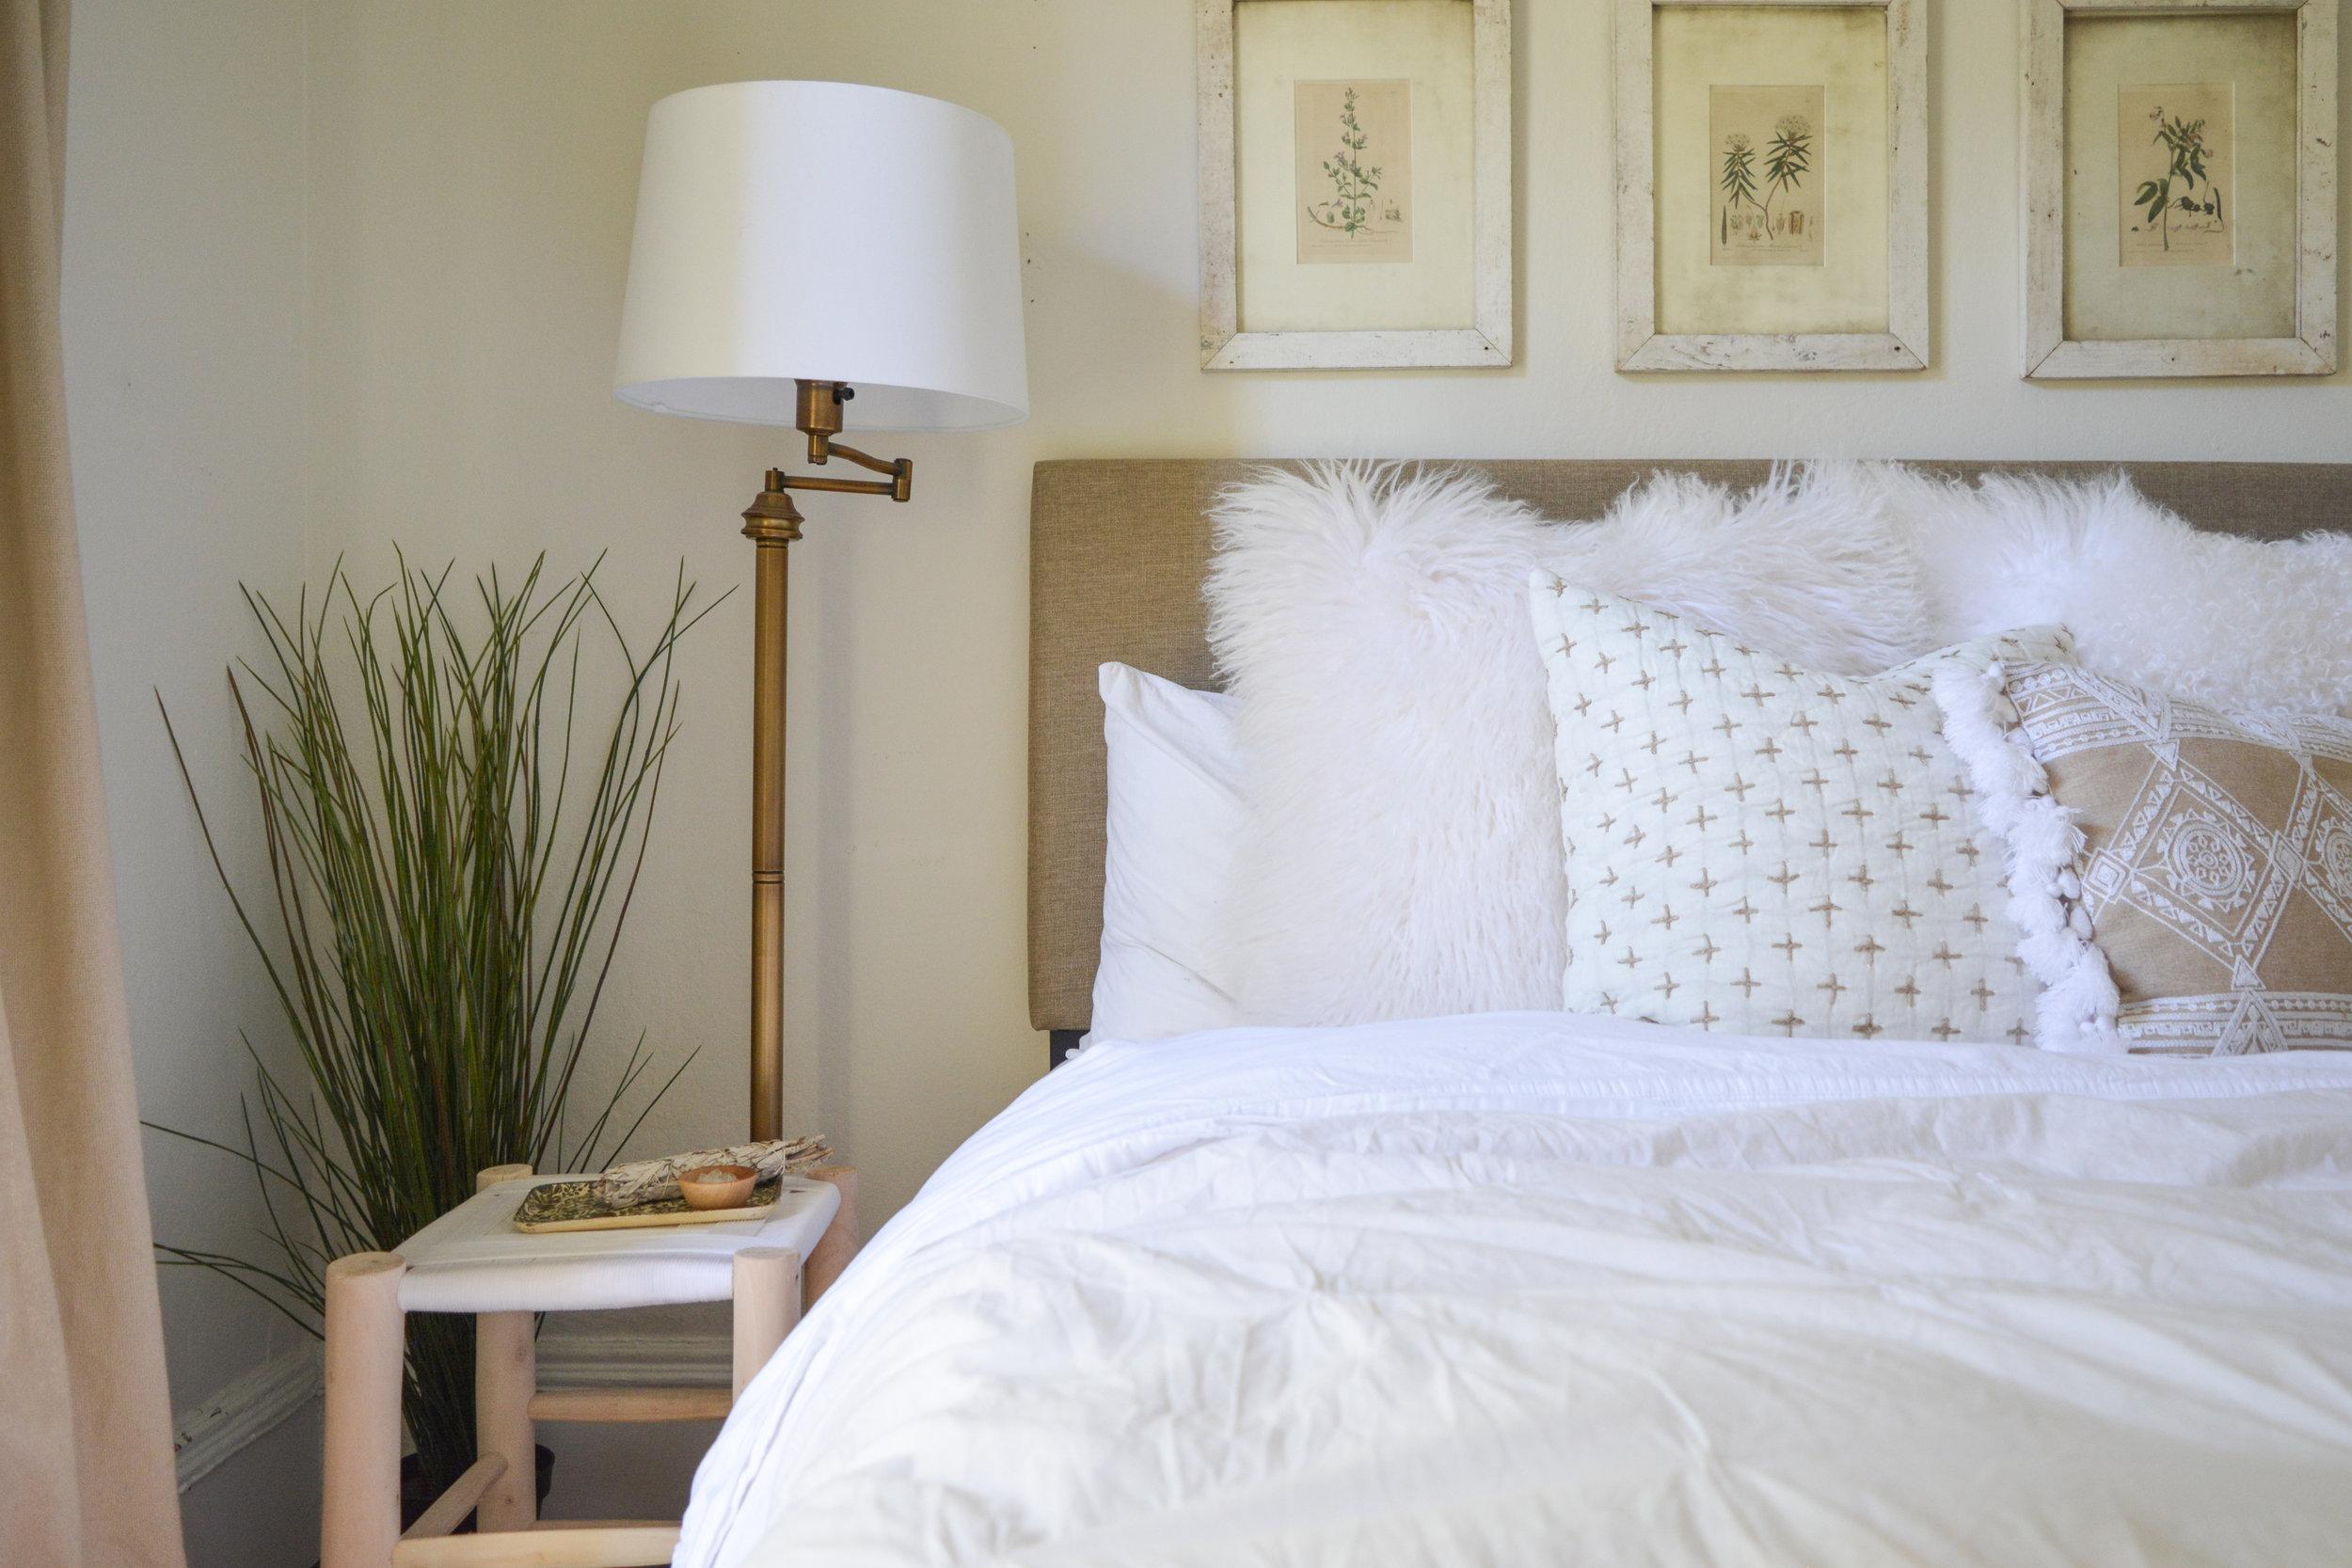 Angela Grace Design // Filbert Guest Bedroom // San Francisco and SF Bay Area Interior Designer, Decorator